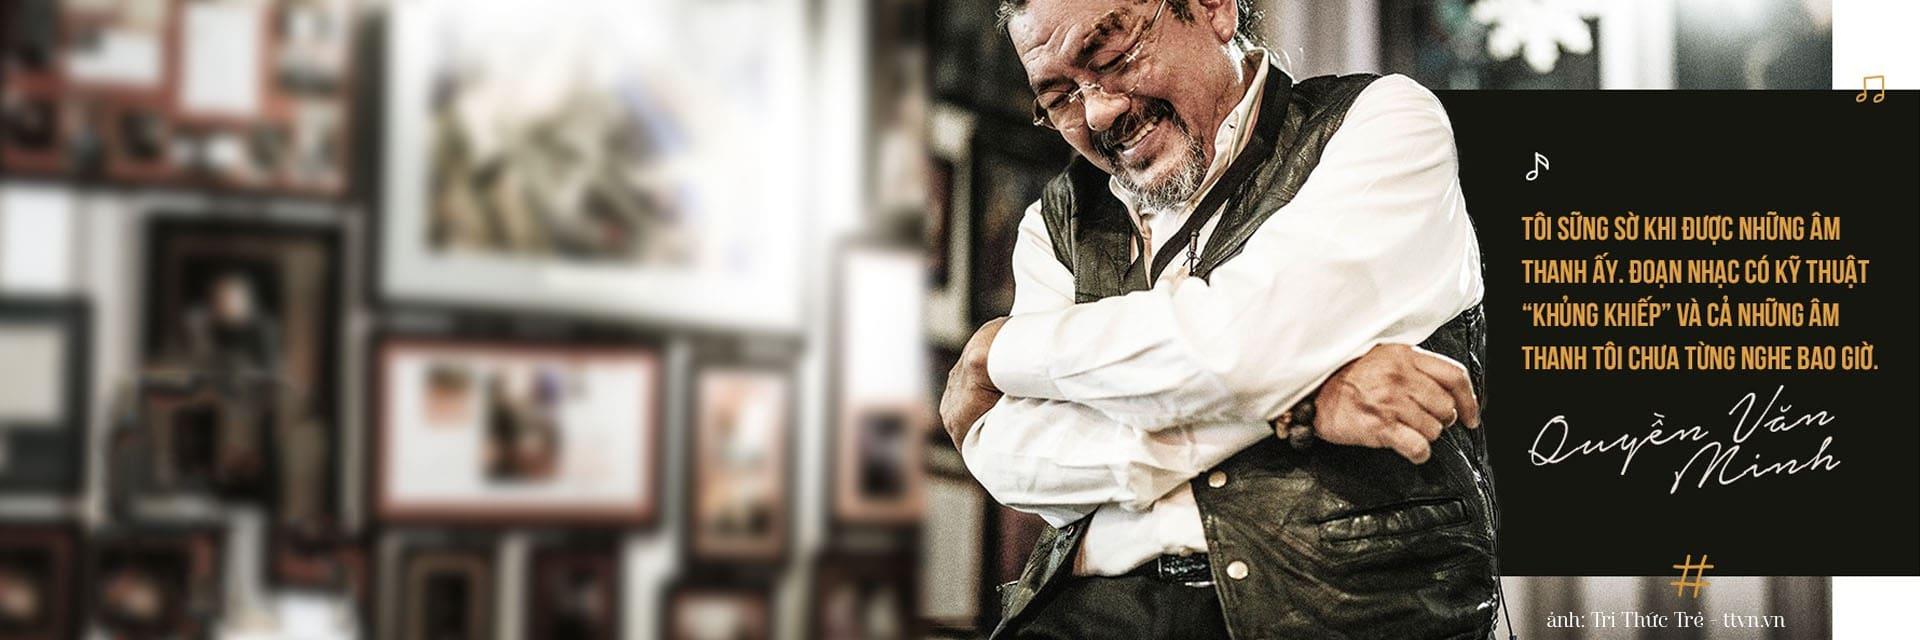 Eminent Artist Quyen Van Minh